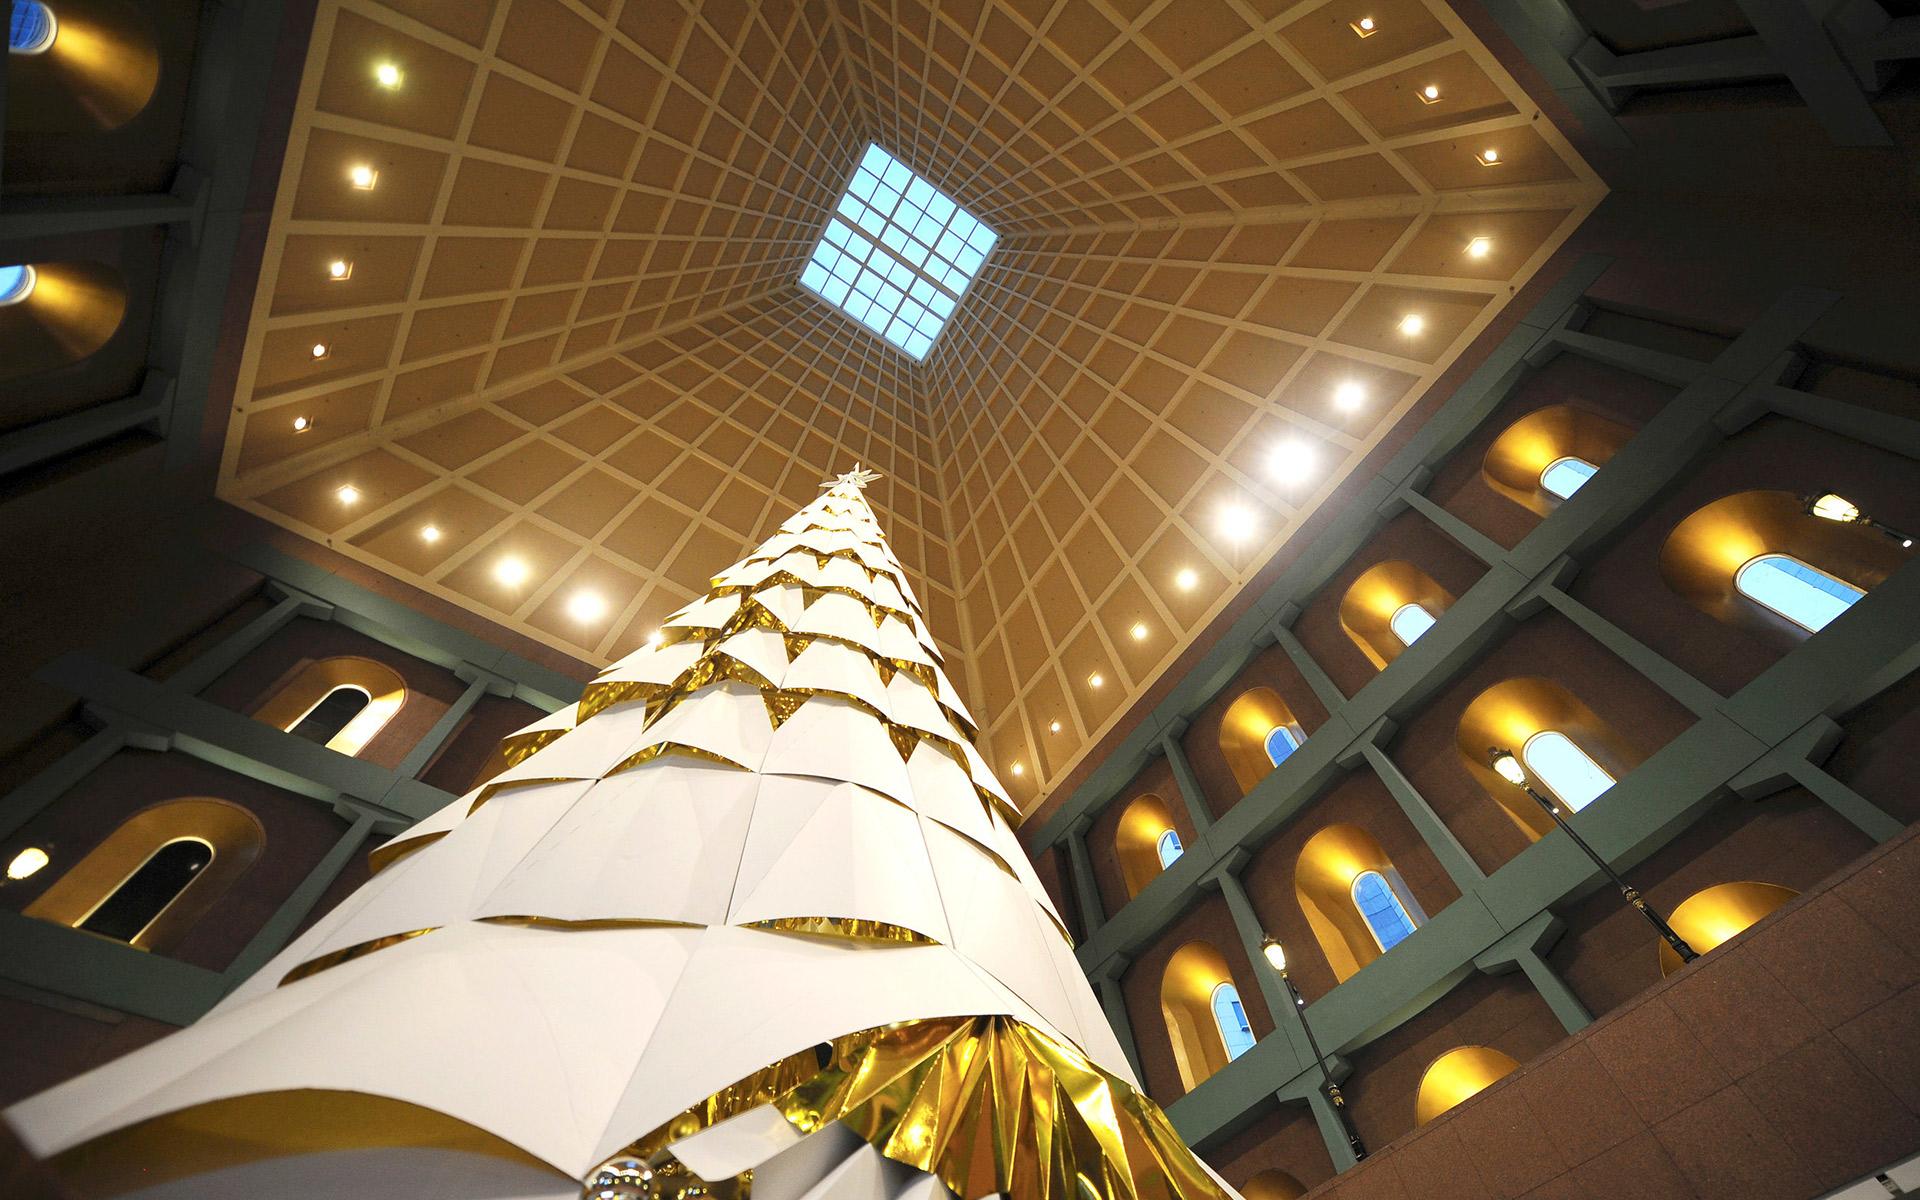 hoc-tree-skylight